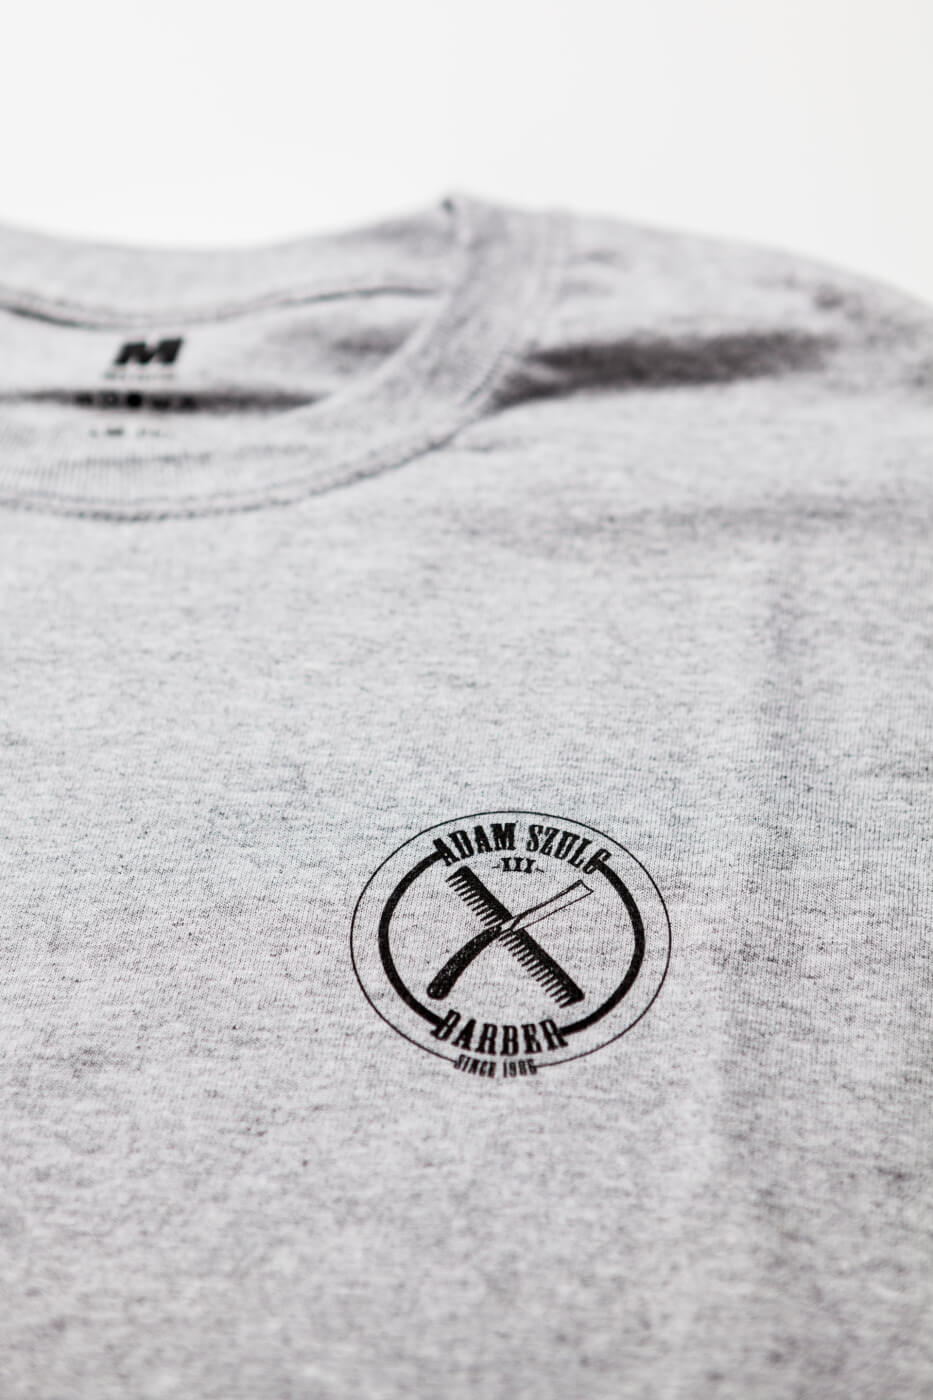 Koszulka Shave And Destroy Szara Gadżety Adam Szulc Barber